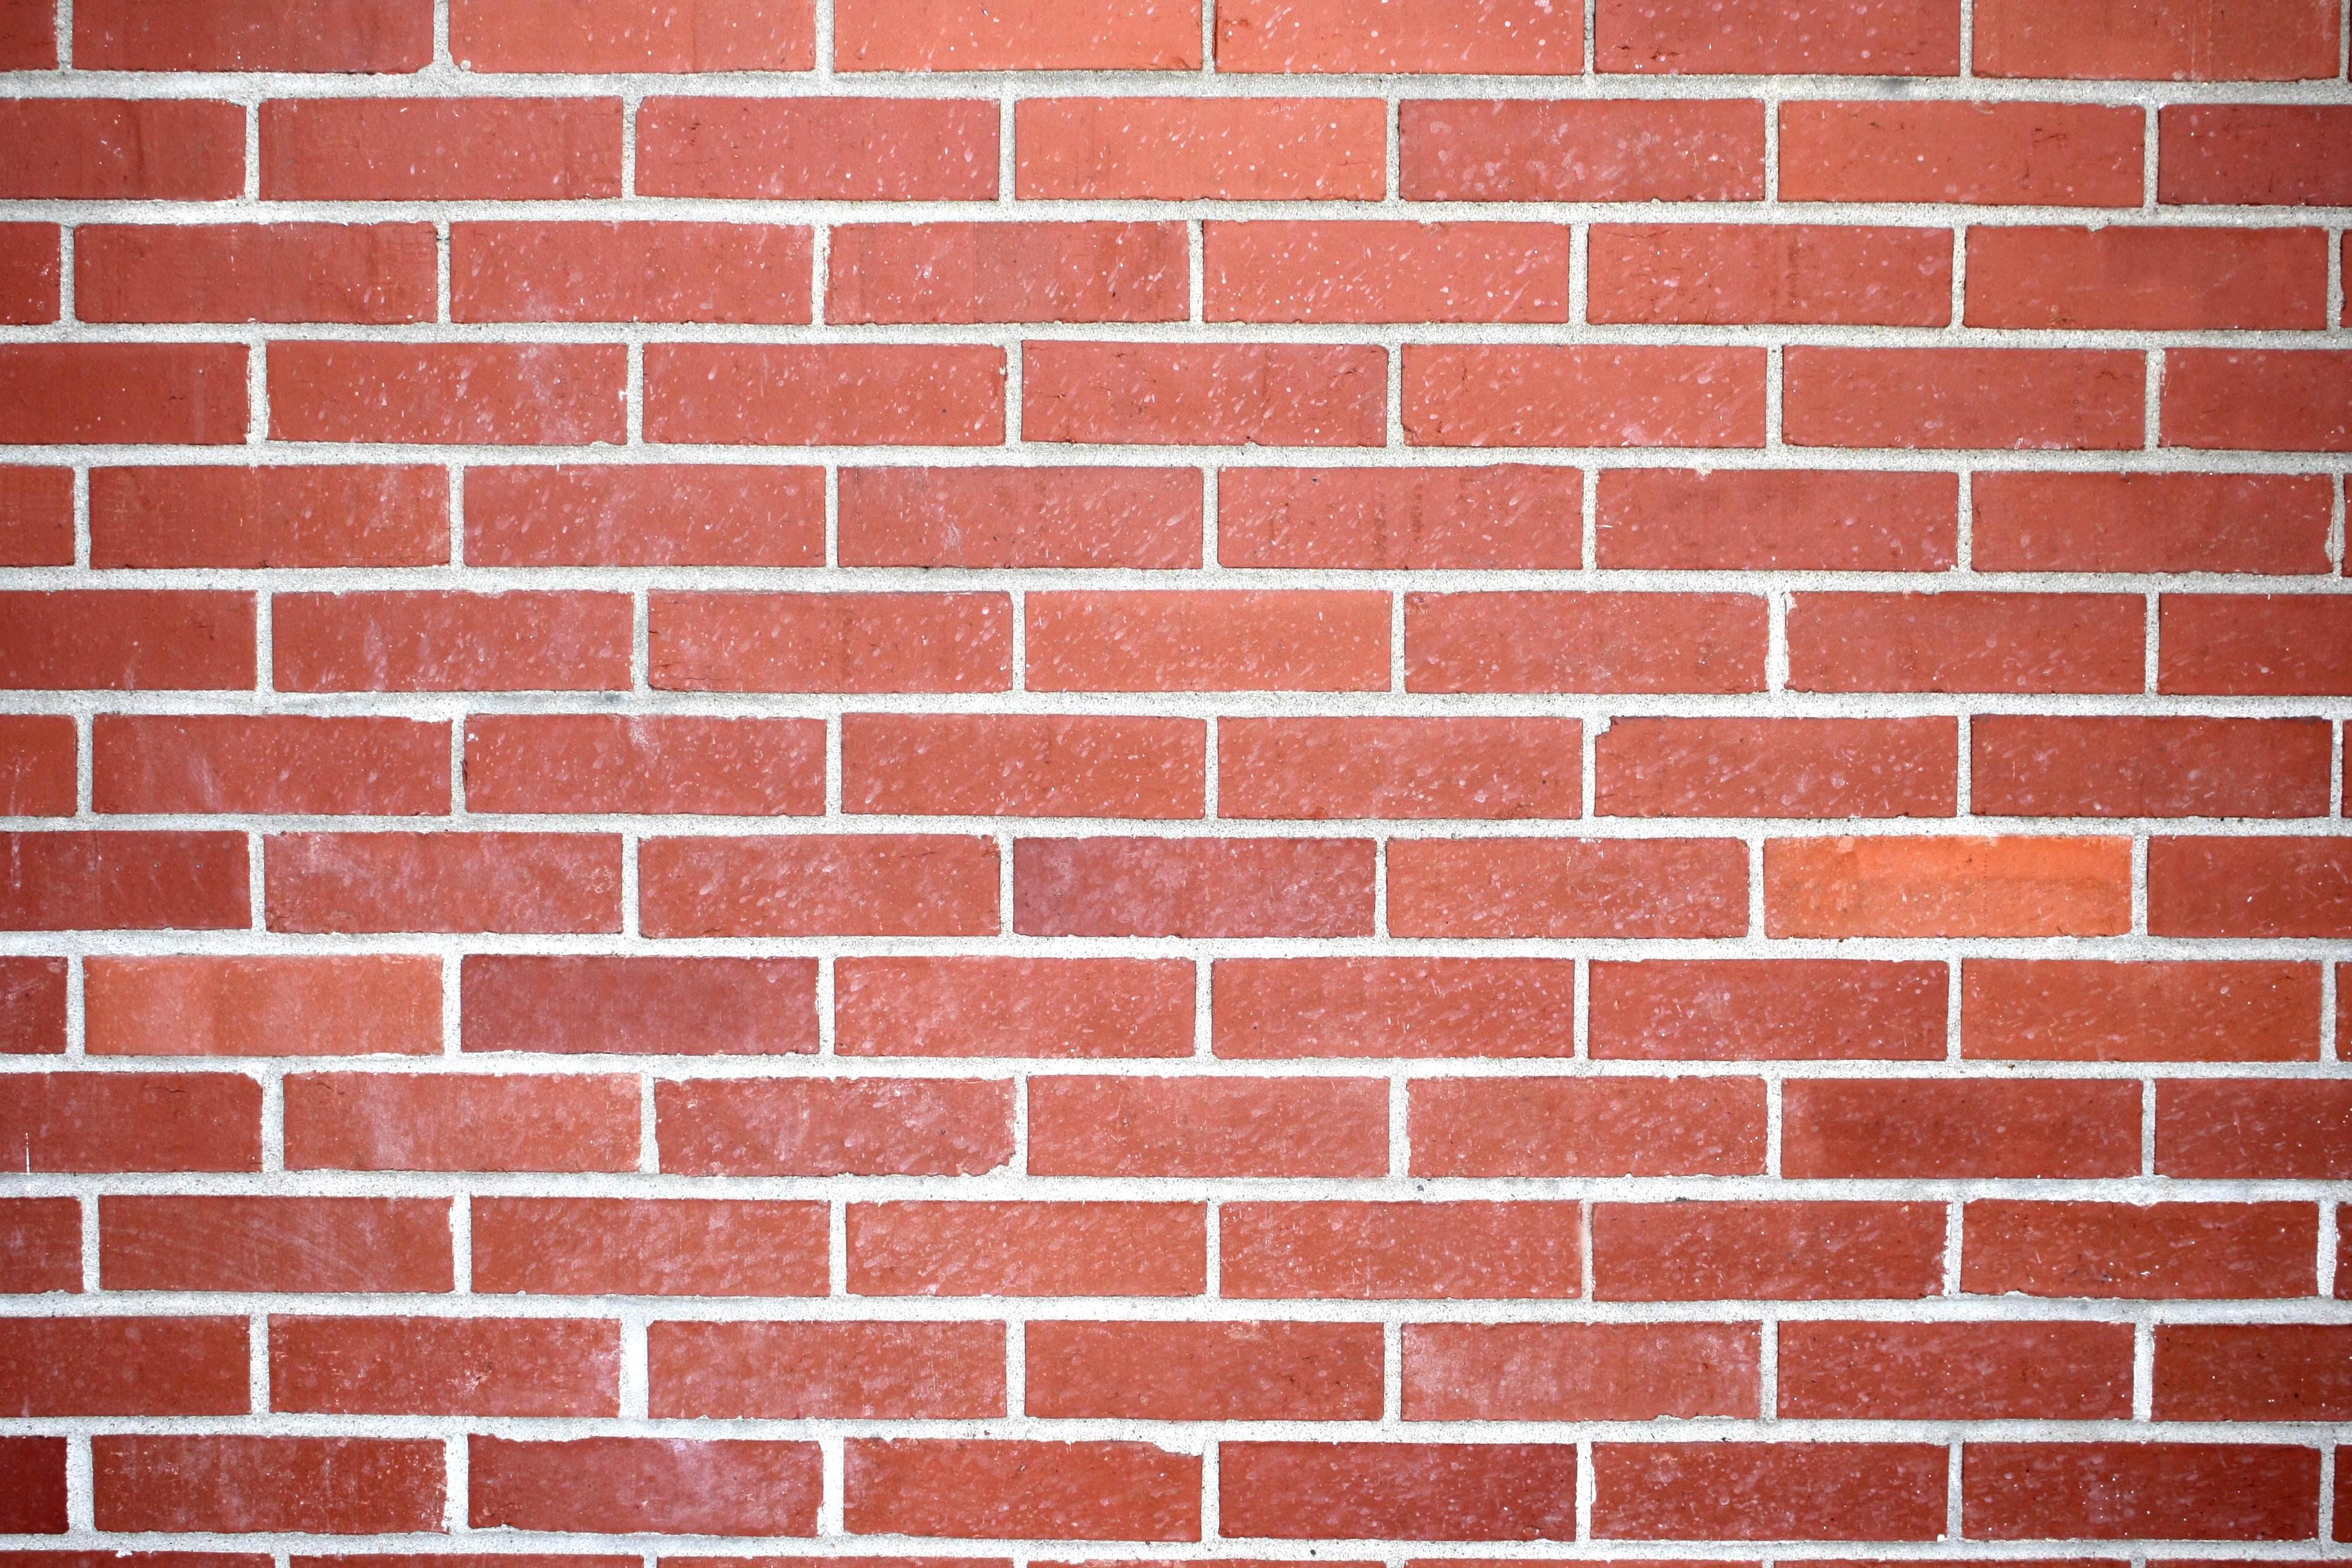 Brick wall background clipart clip art free stock Brick wall background clipart 8 » Clipart Station clip art free stock